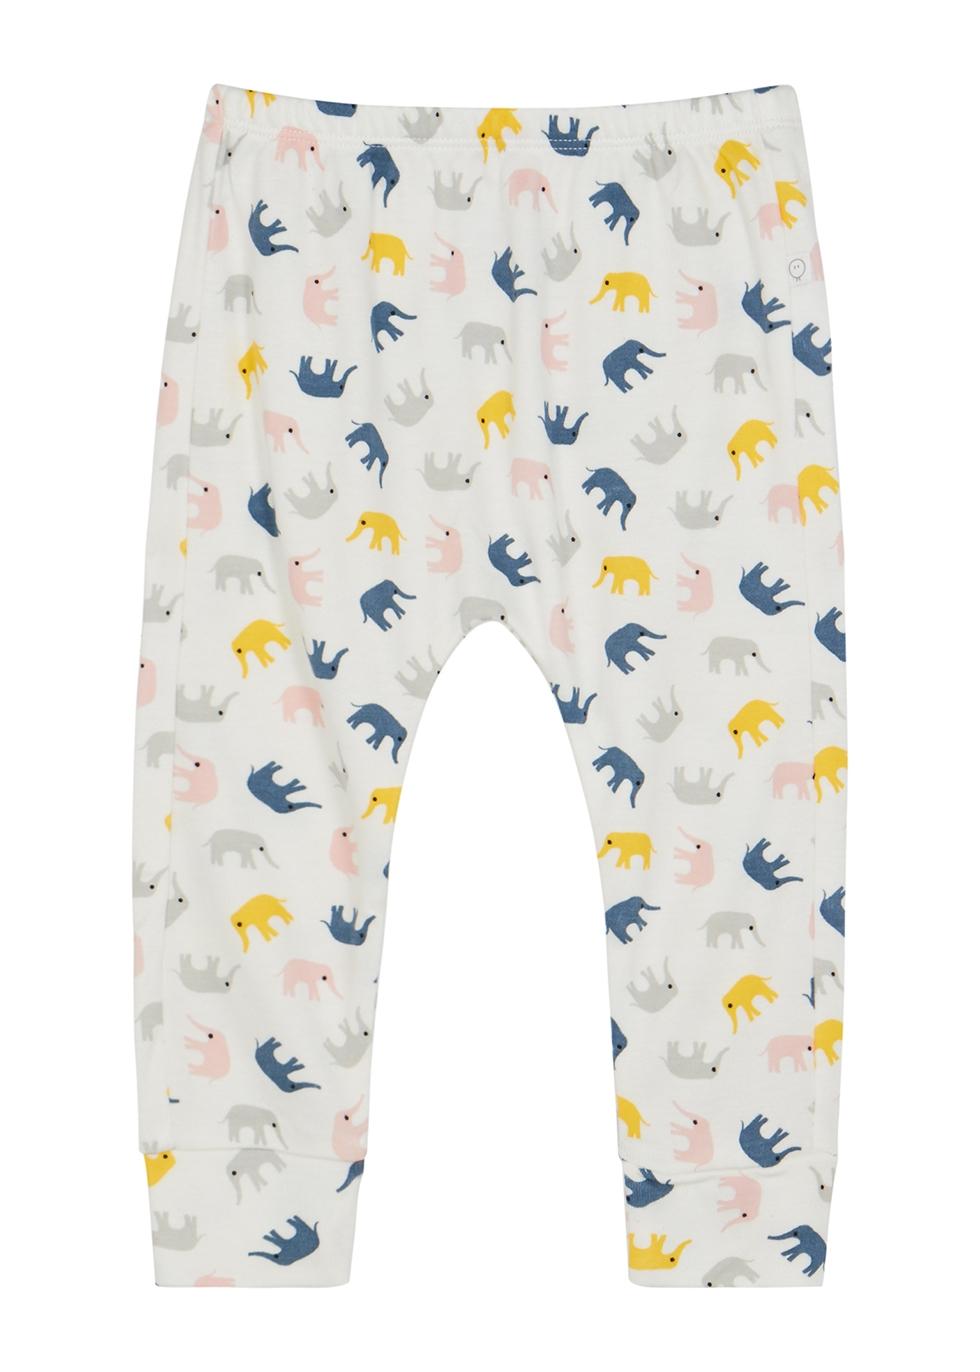 Elephant-print jersey leggings